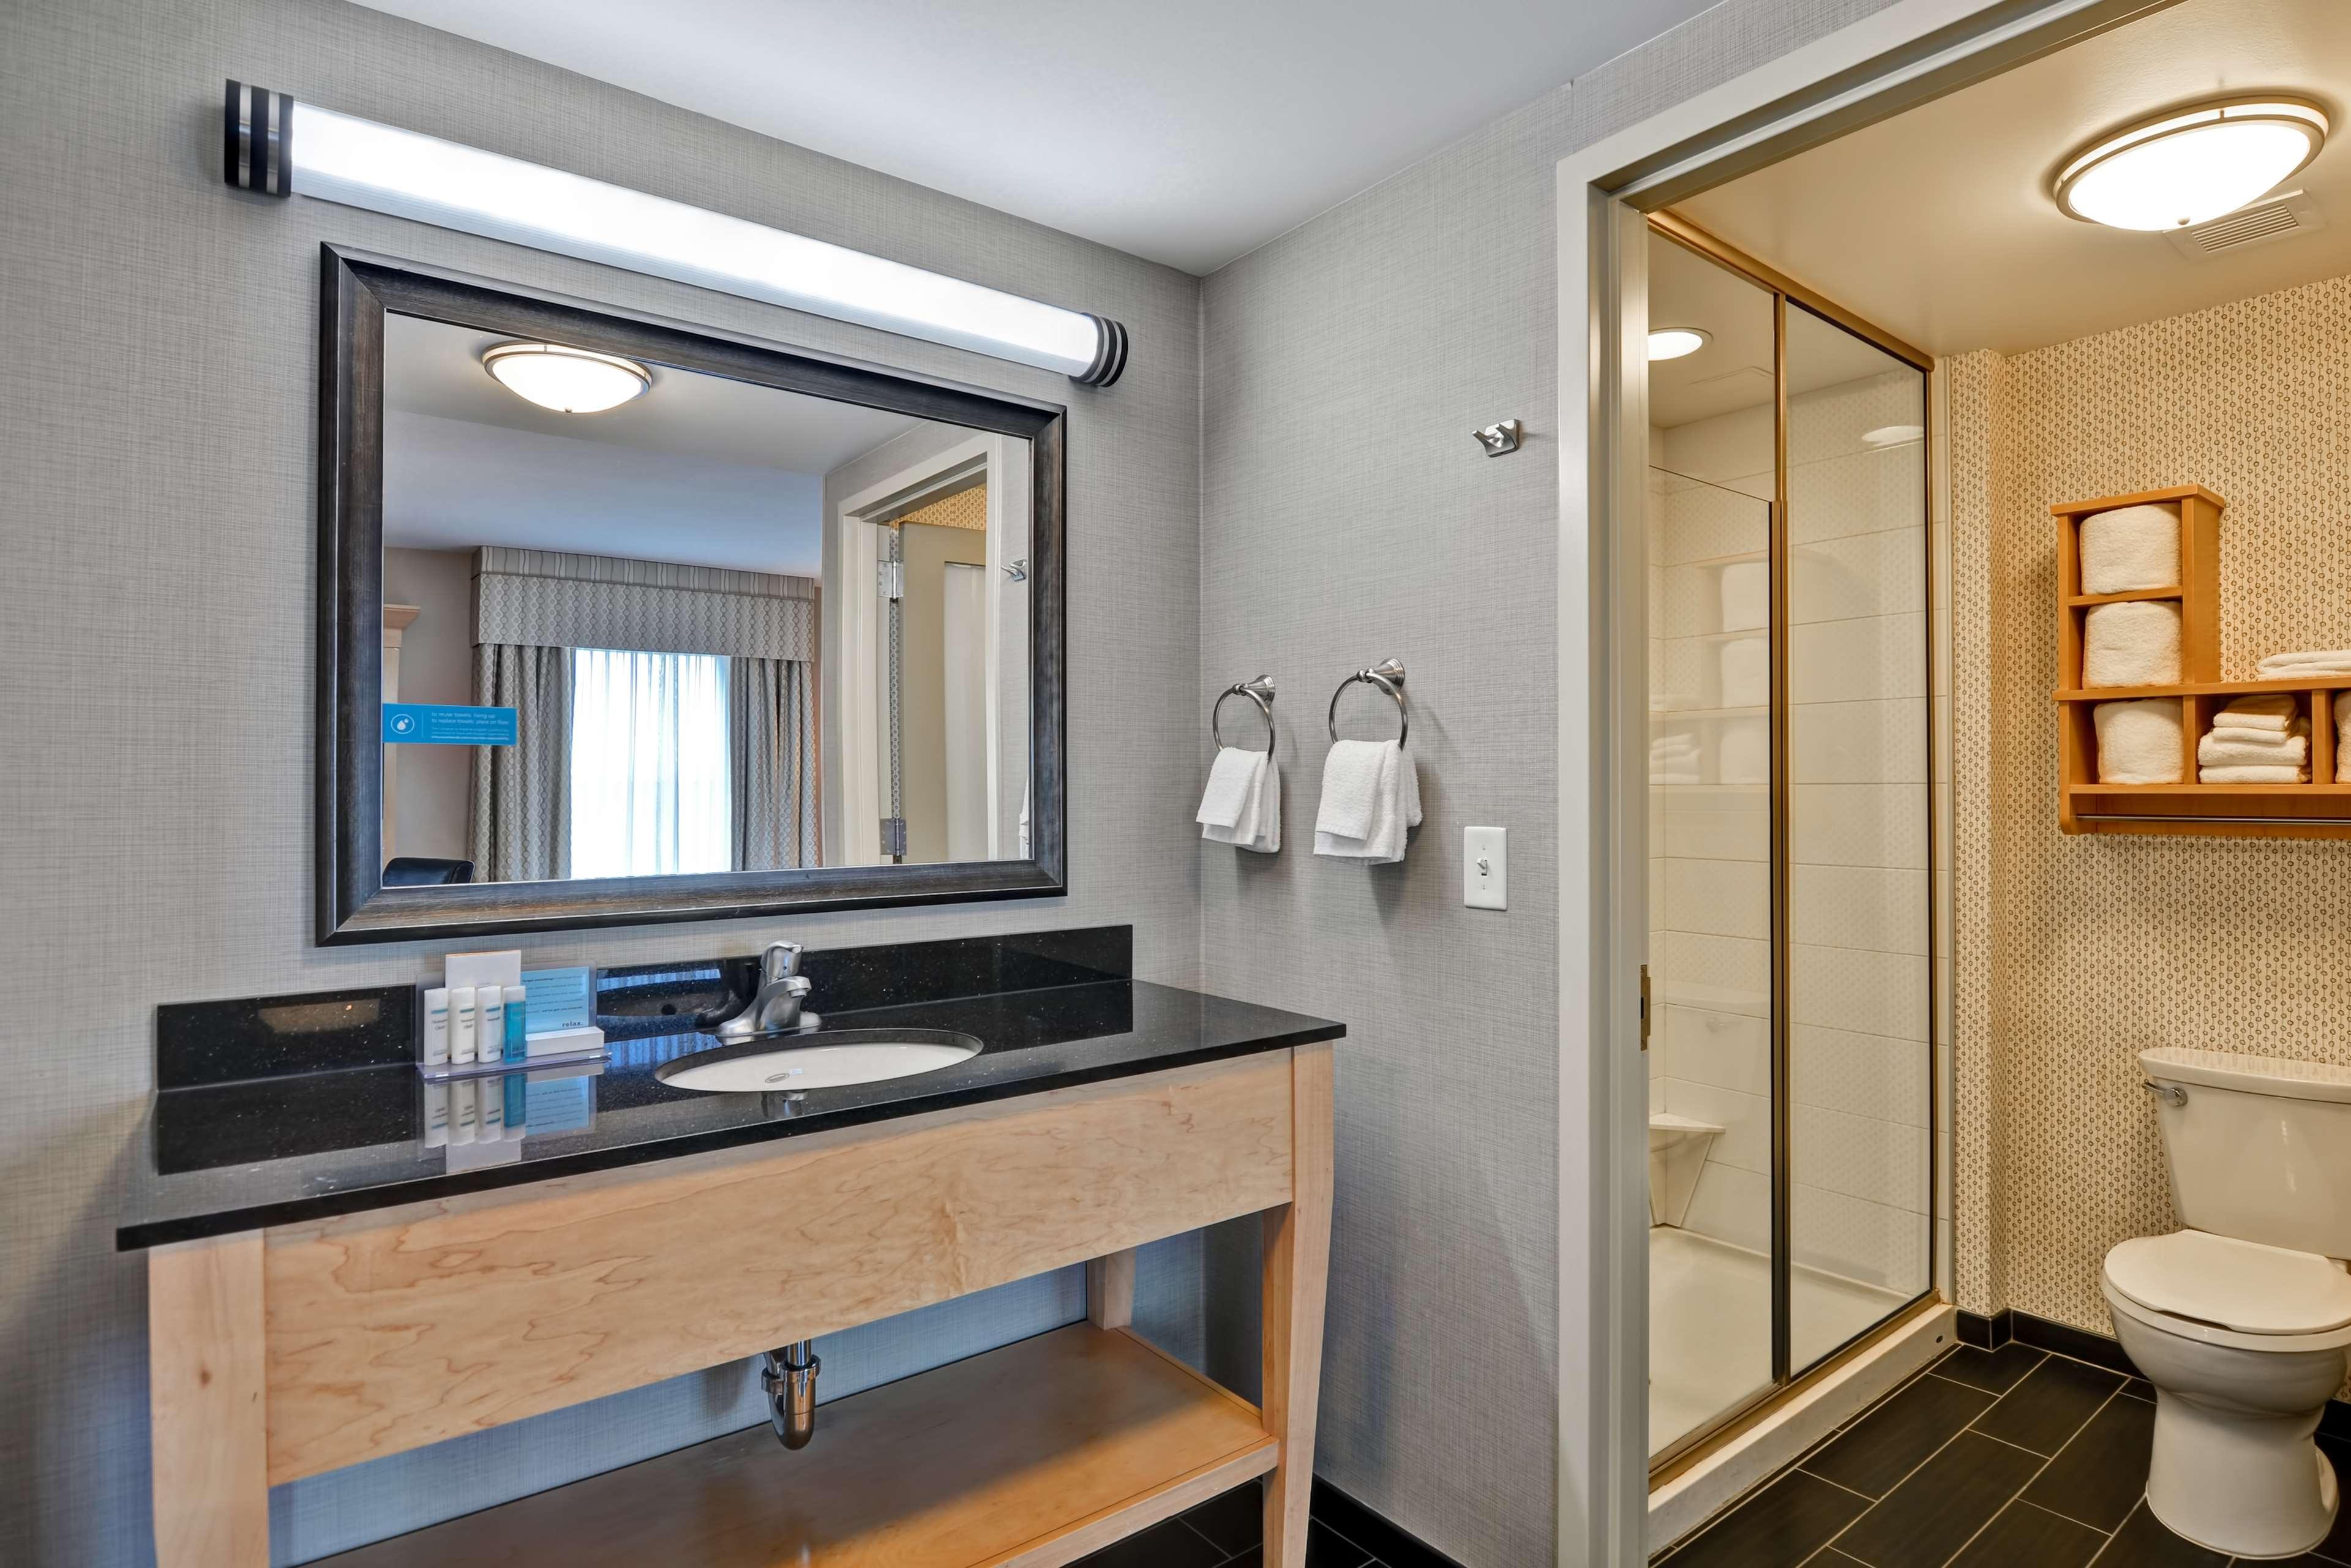 Hampton Inn & Suites Raleigh/Crabtree Valley image 0